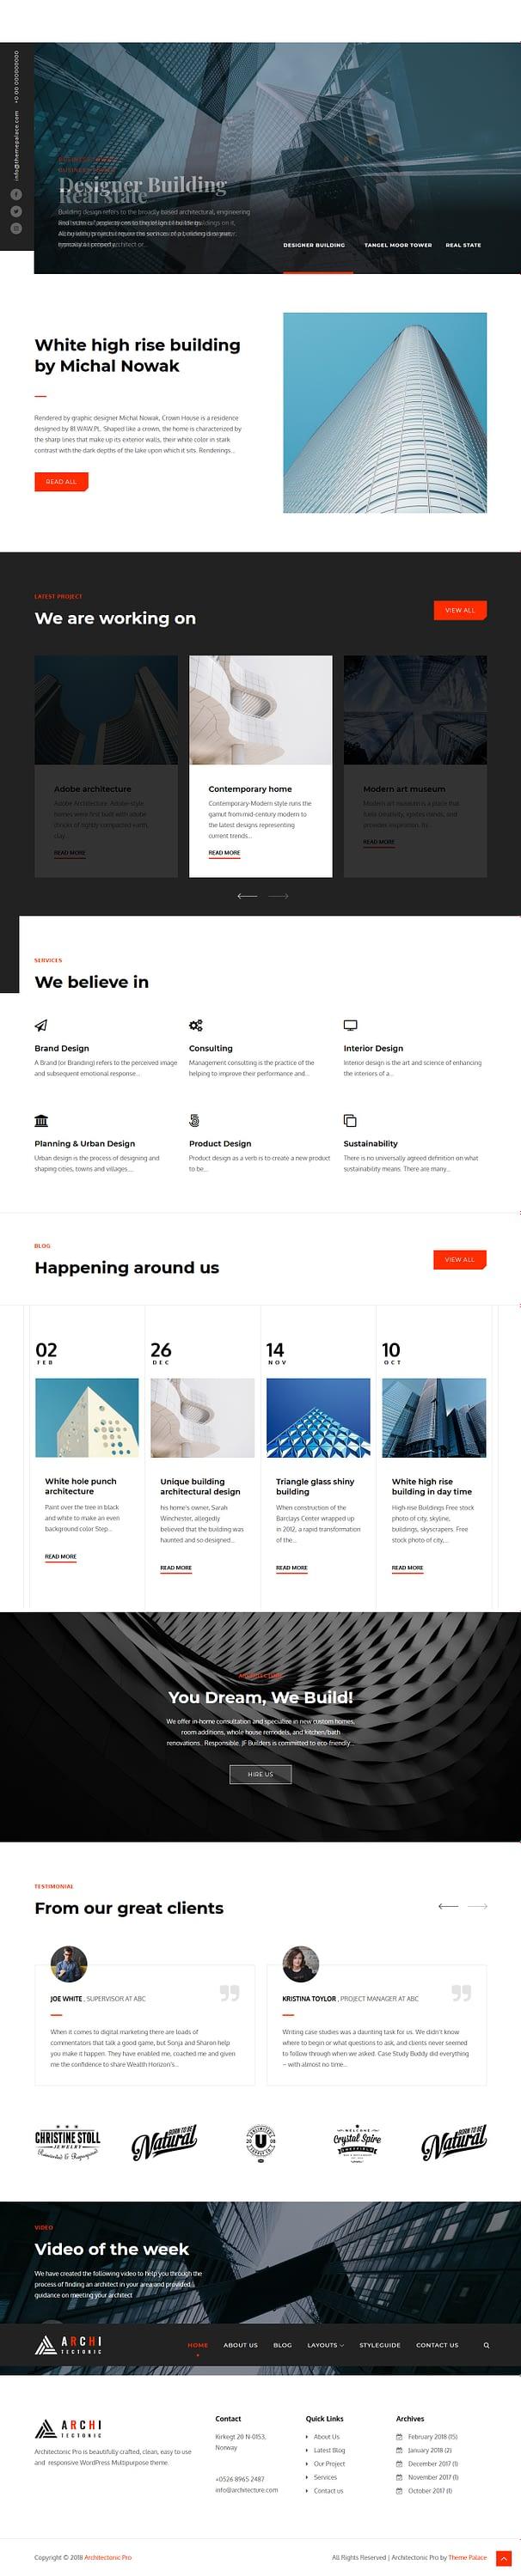 architectonic best free architecture wordpress theme - 10+ Best Free Architecture WordPress Themes